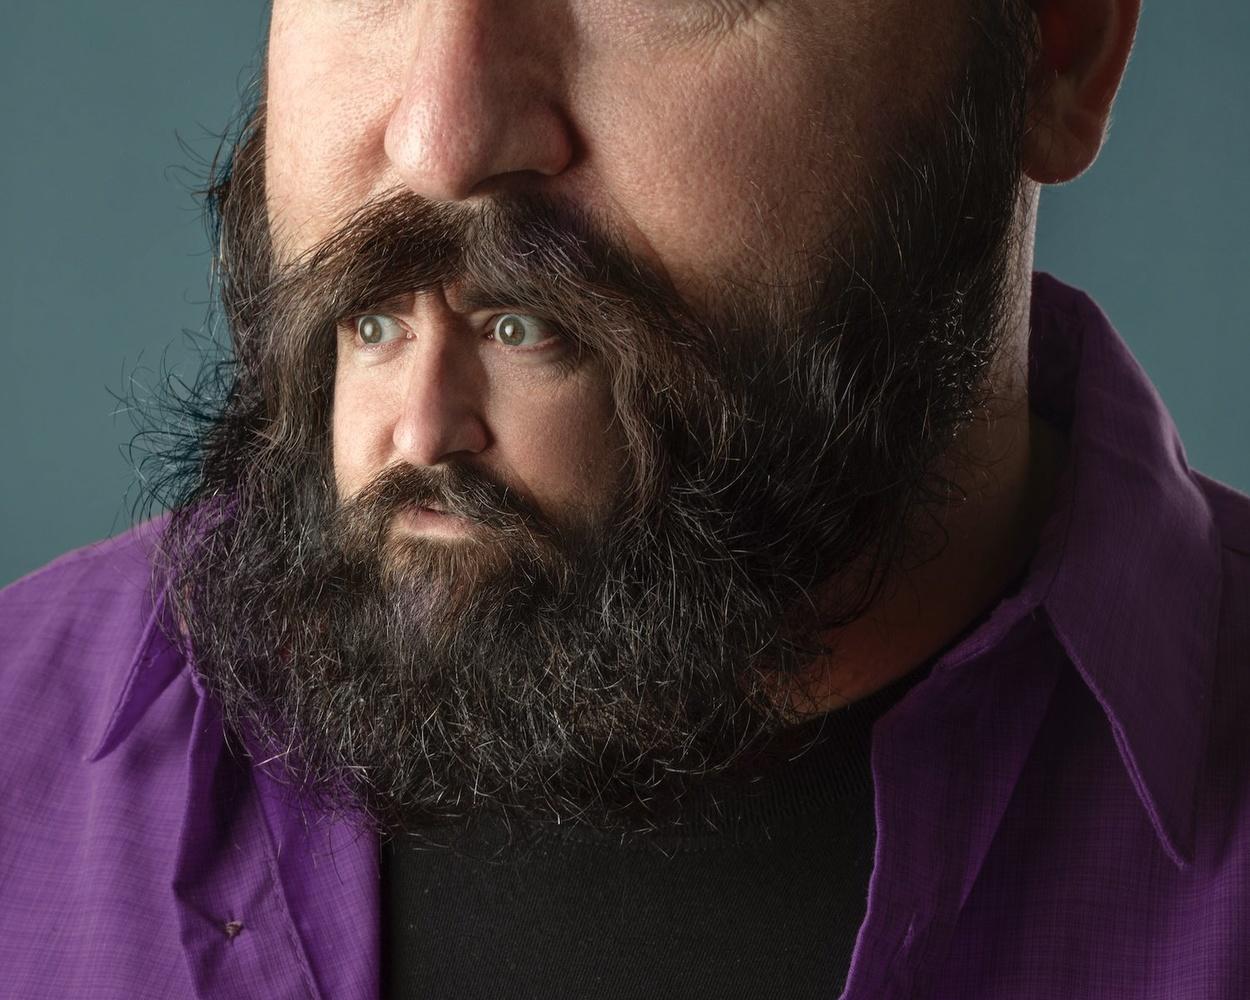 Beard Gremlin by Daniel Jackson